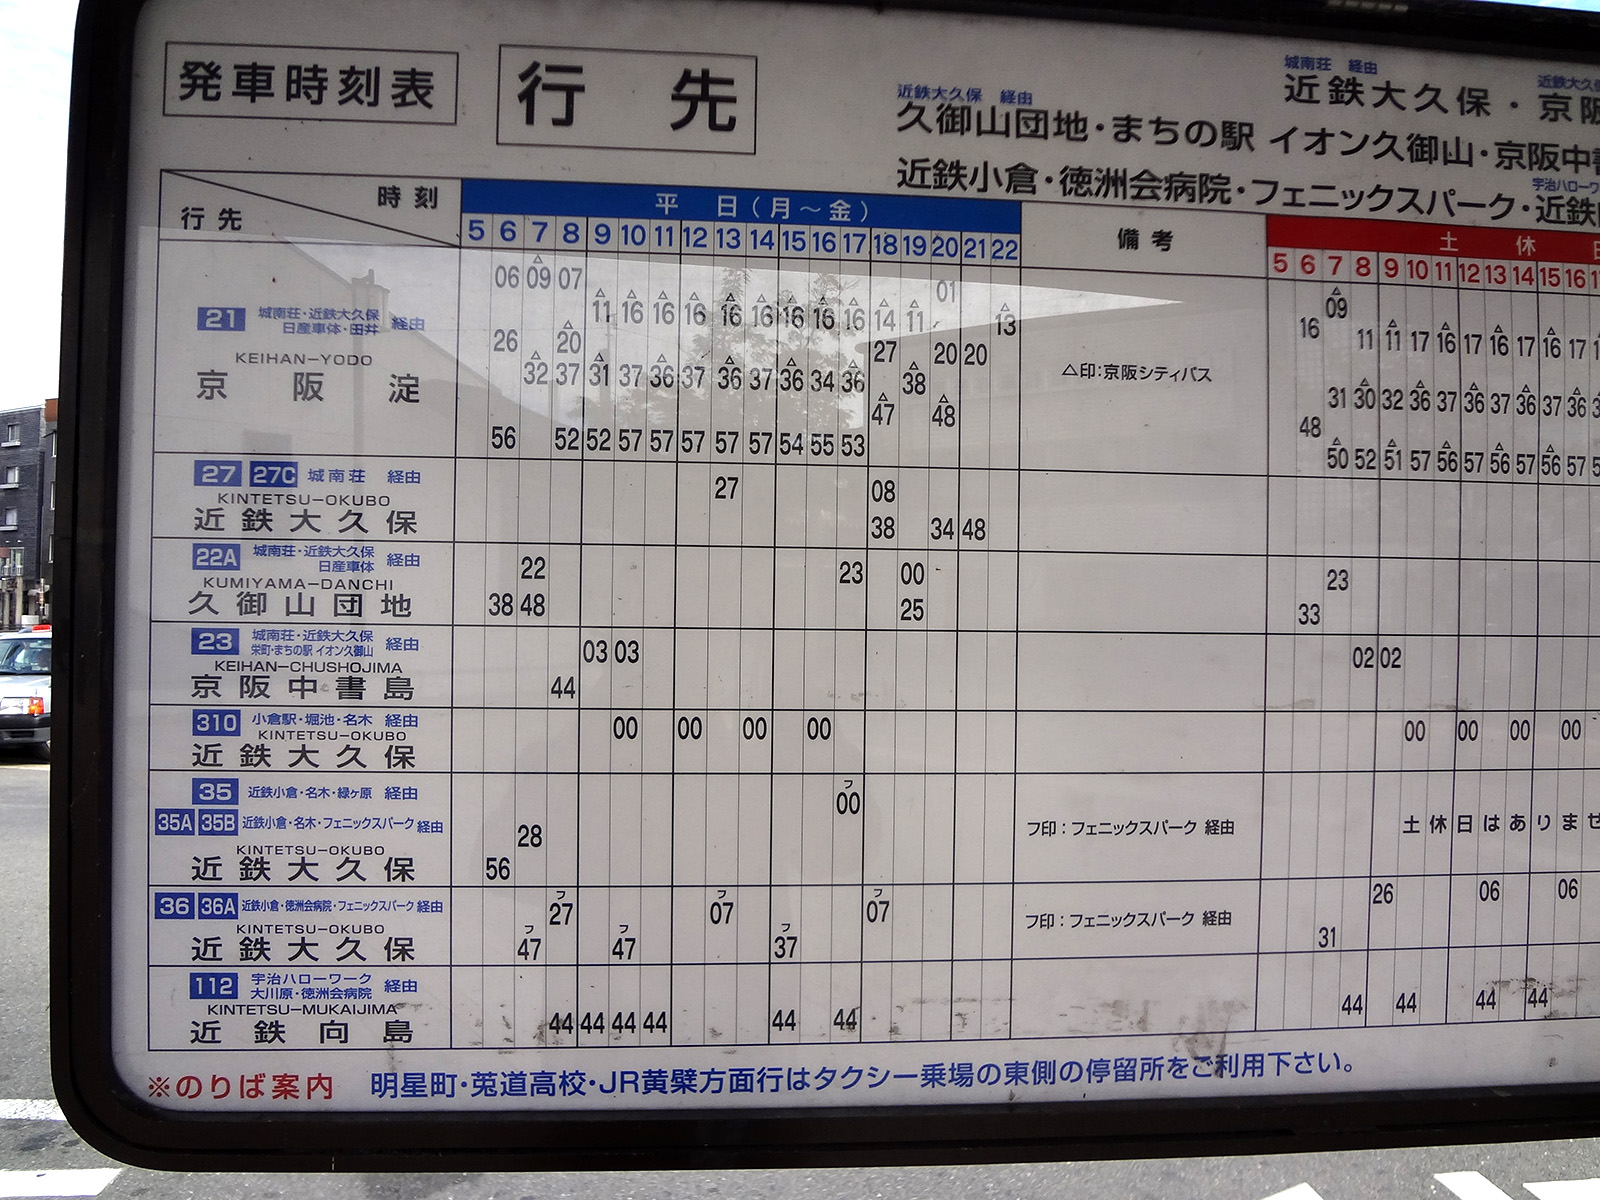 Uji bus schedule